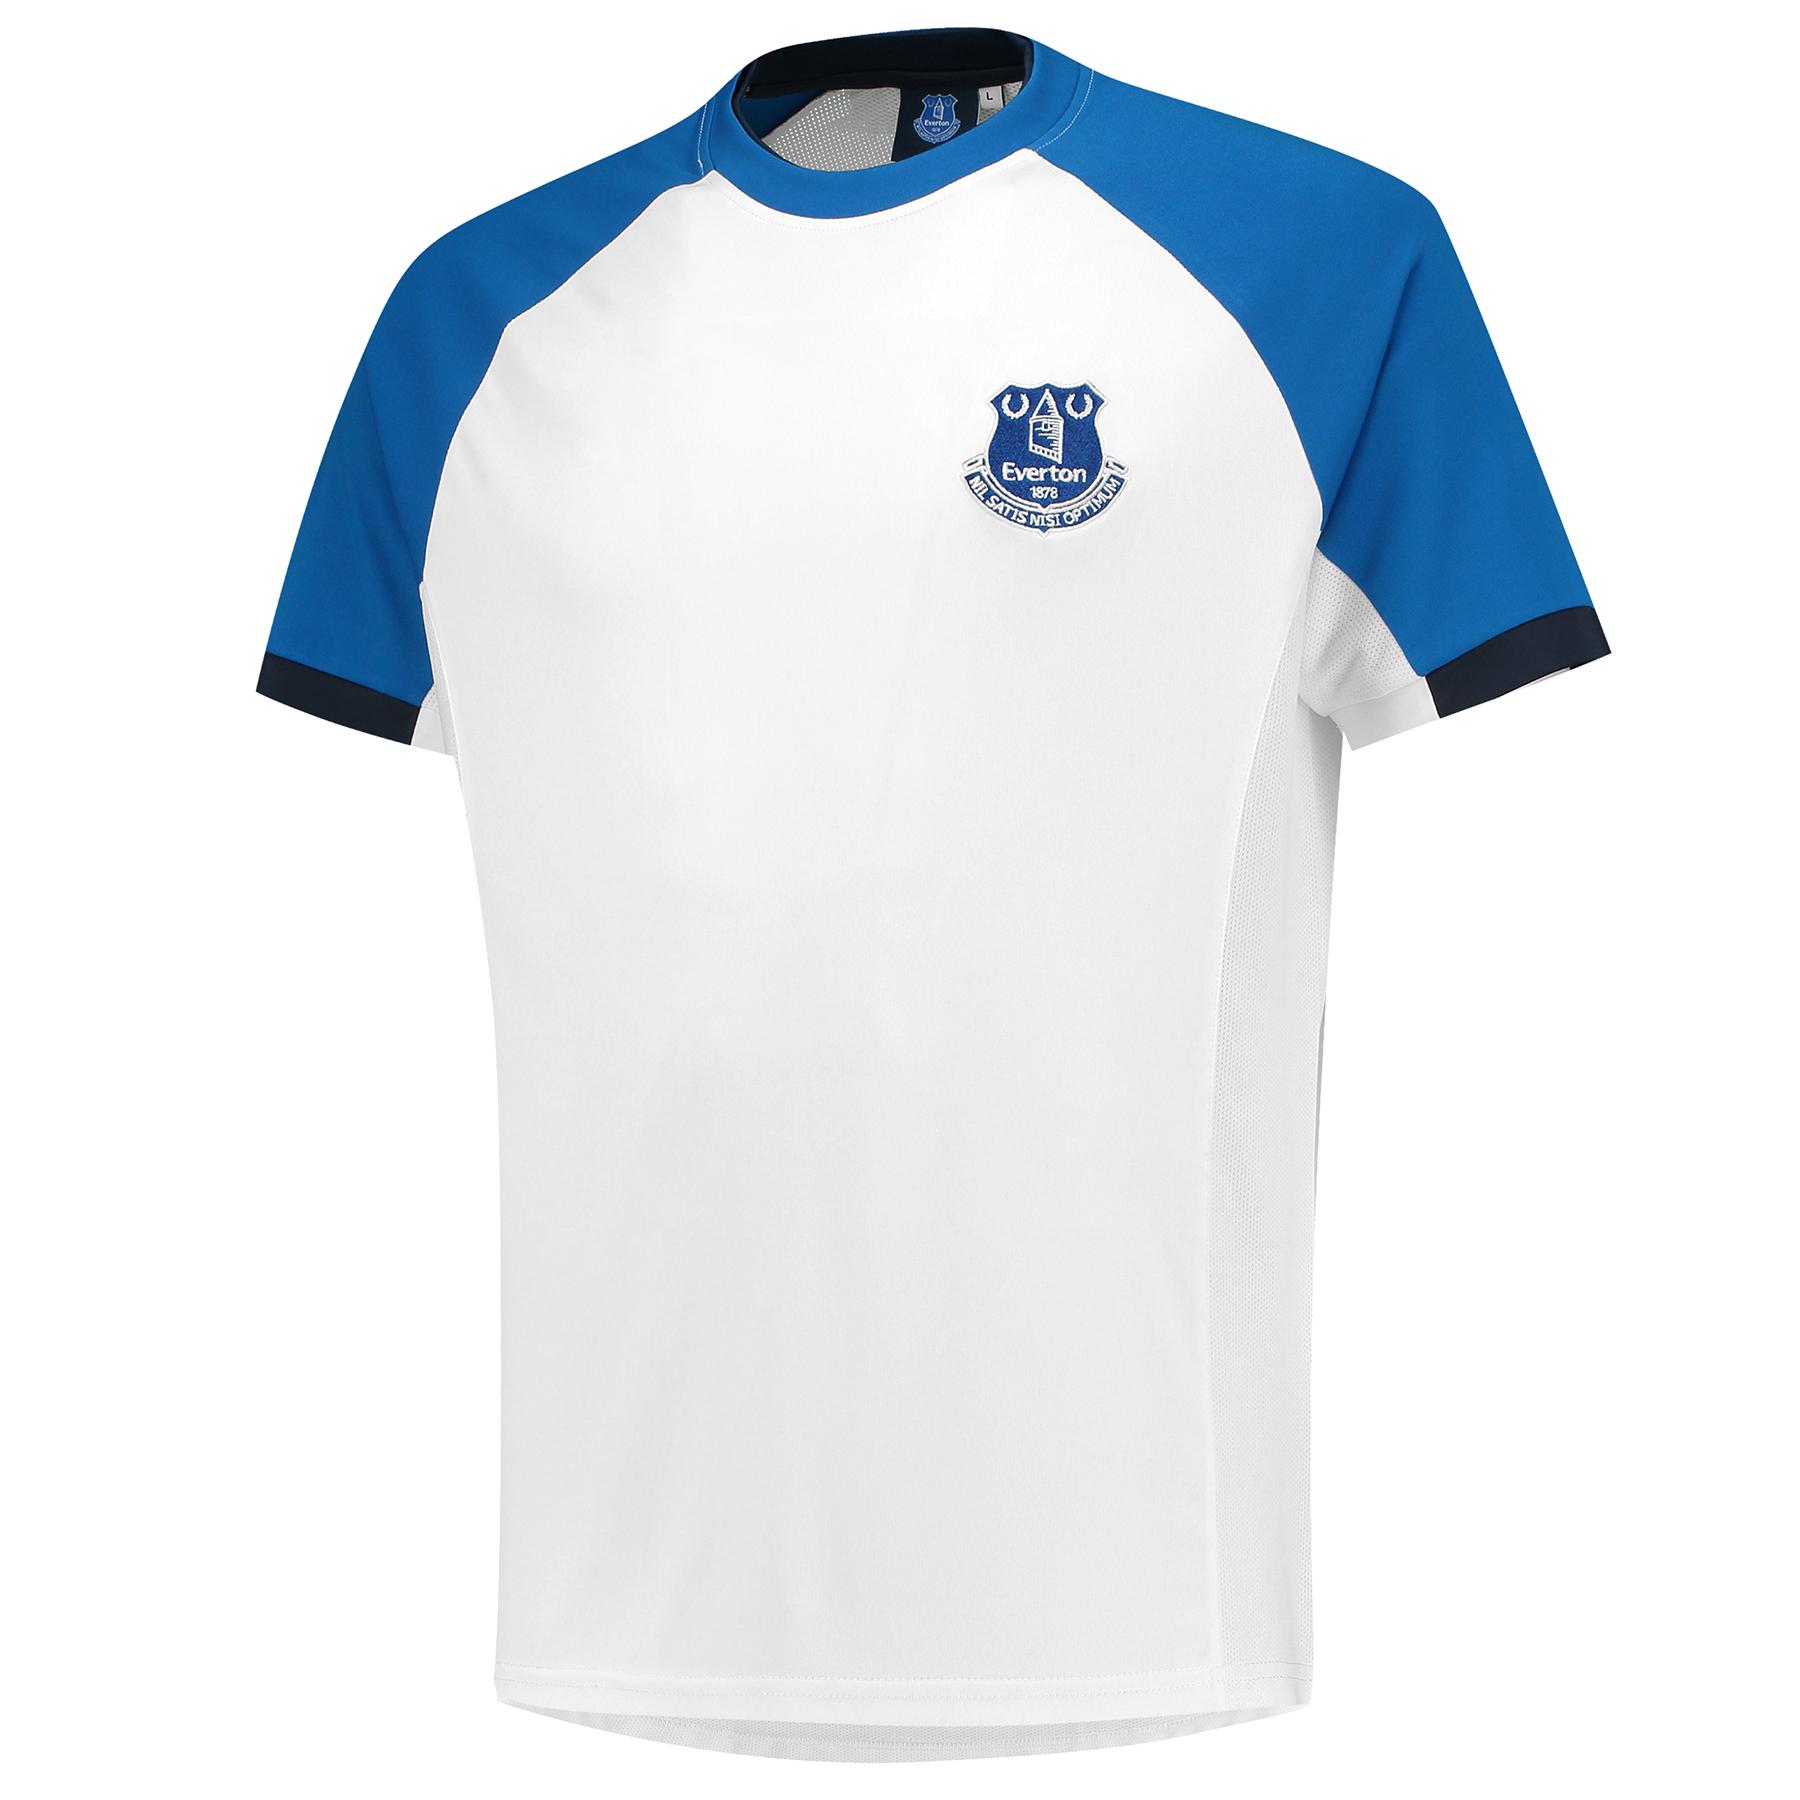 Everton Poly T-Shirt - White/Royal - Mens